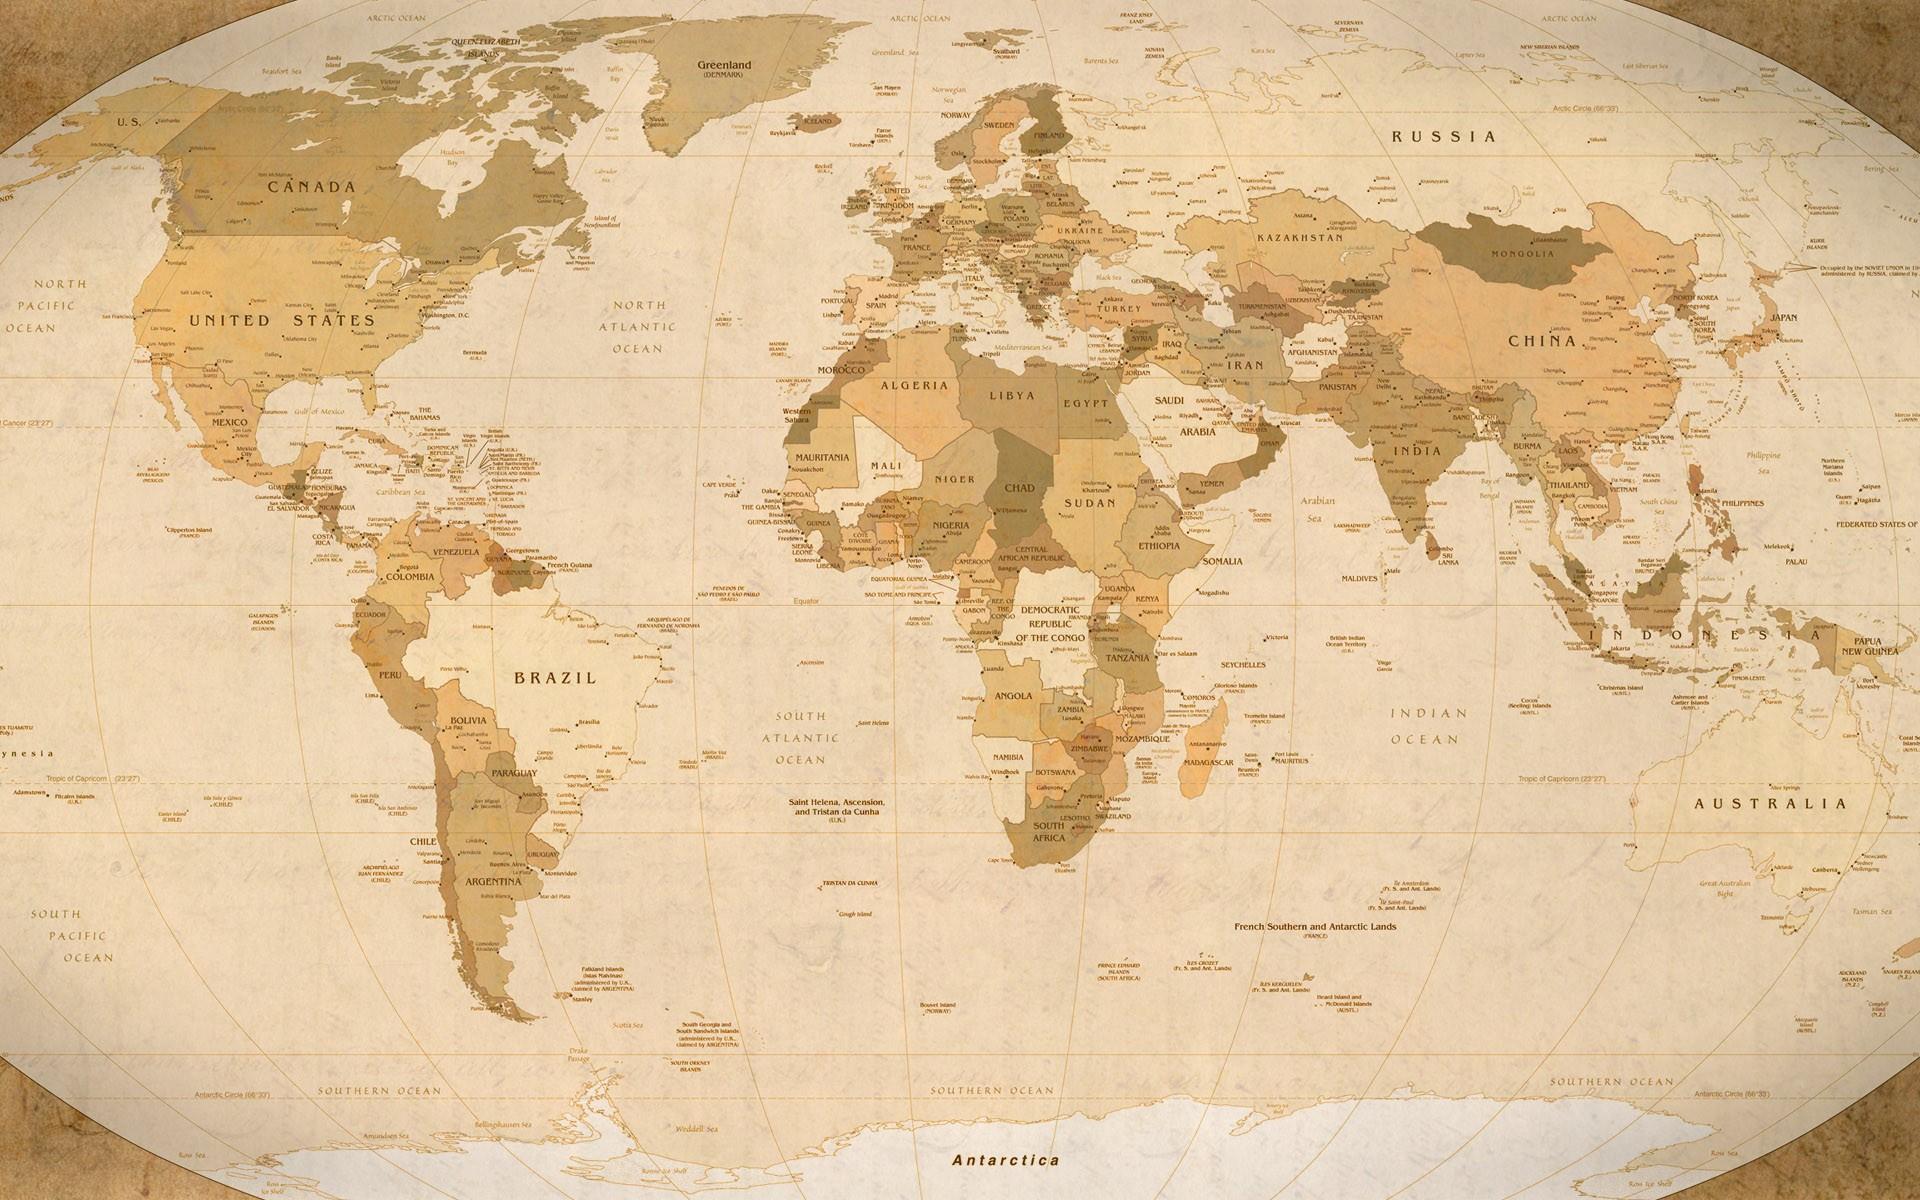 Cartina Geografica Mondo Antica.Sfondi Legna Carta Geografica Mappa Del Mondo Storia Antica 1920x1200 Rsd 231978 Sfondi Gratis Wallhere